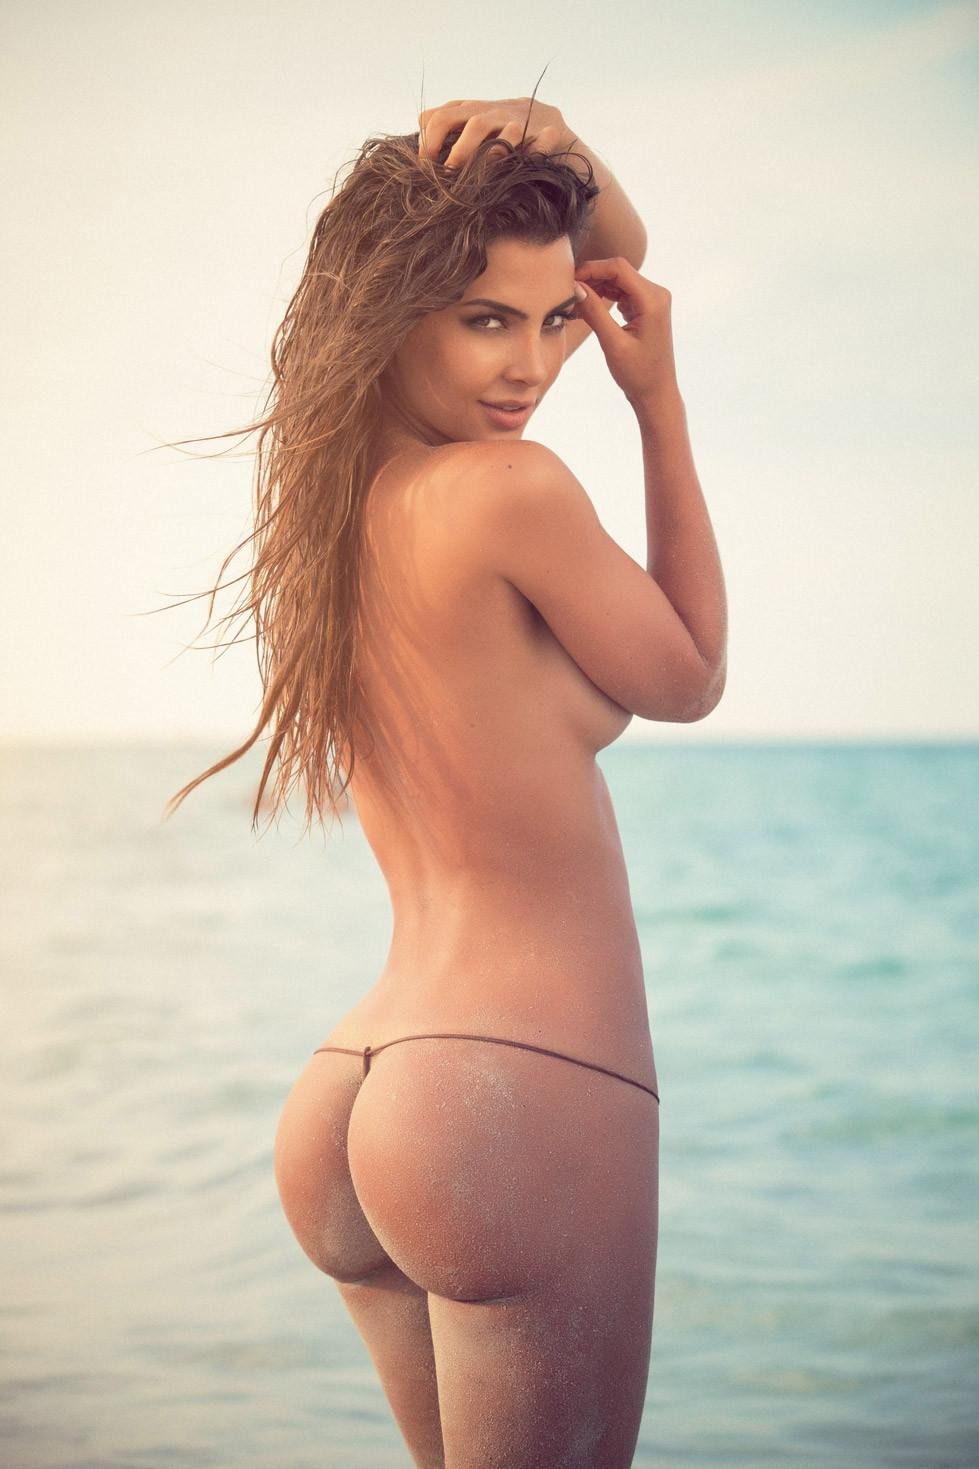 Barbara bermuda butt naked